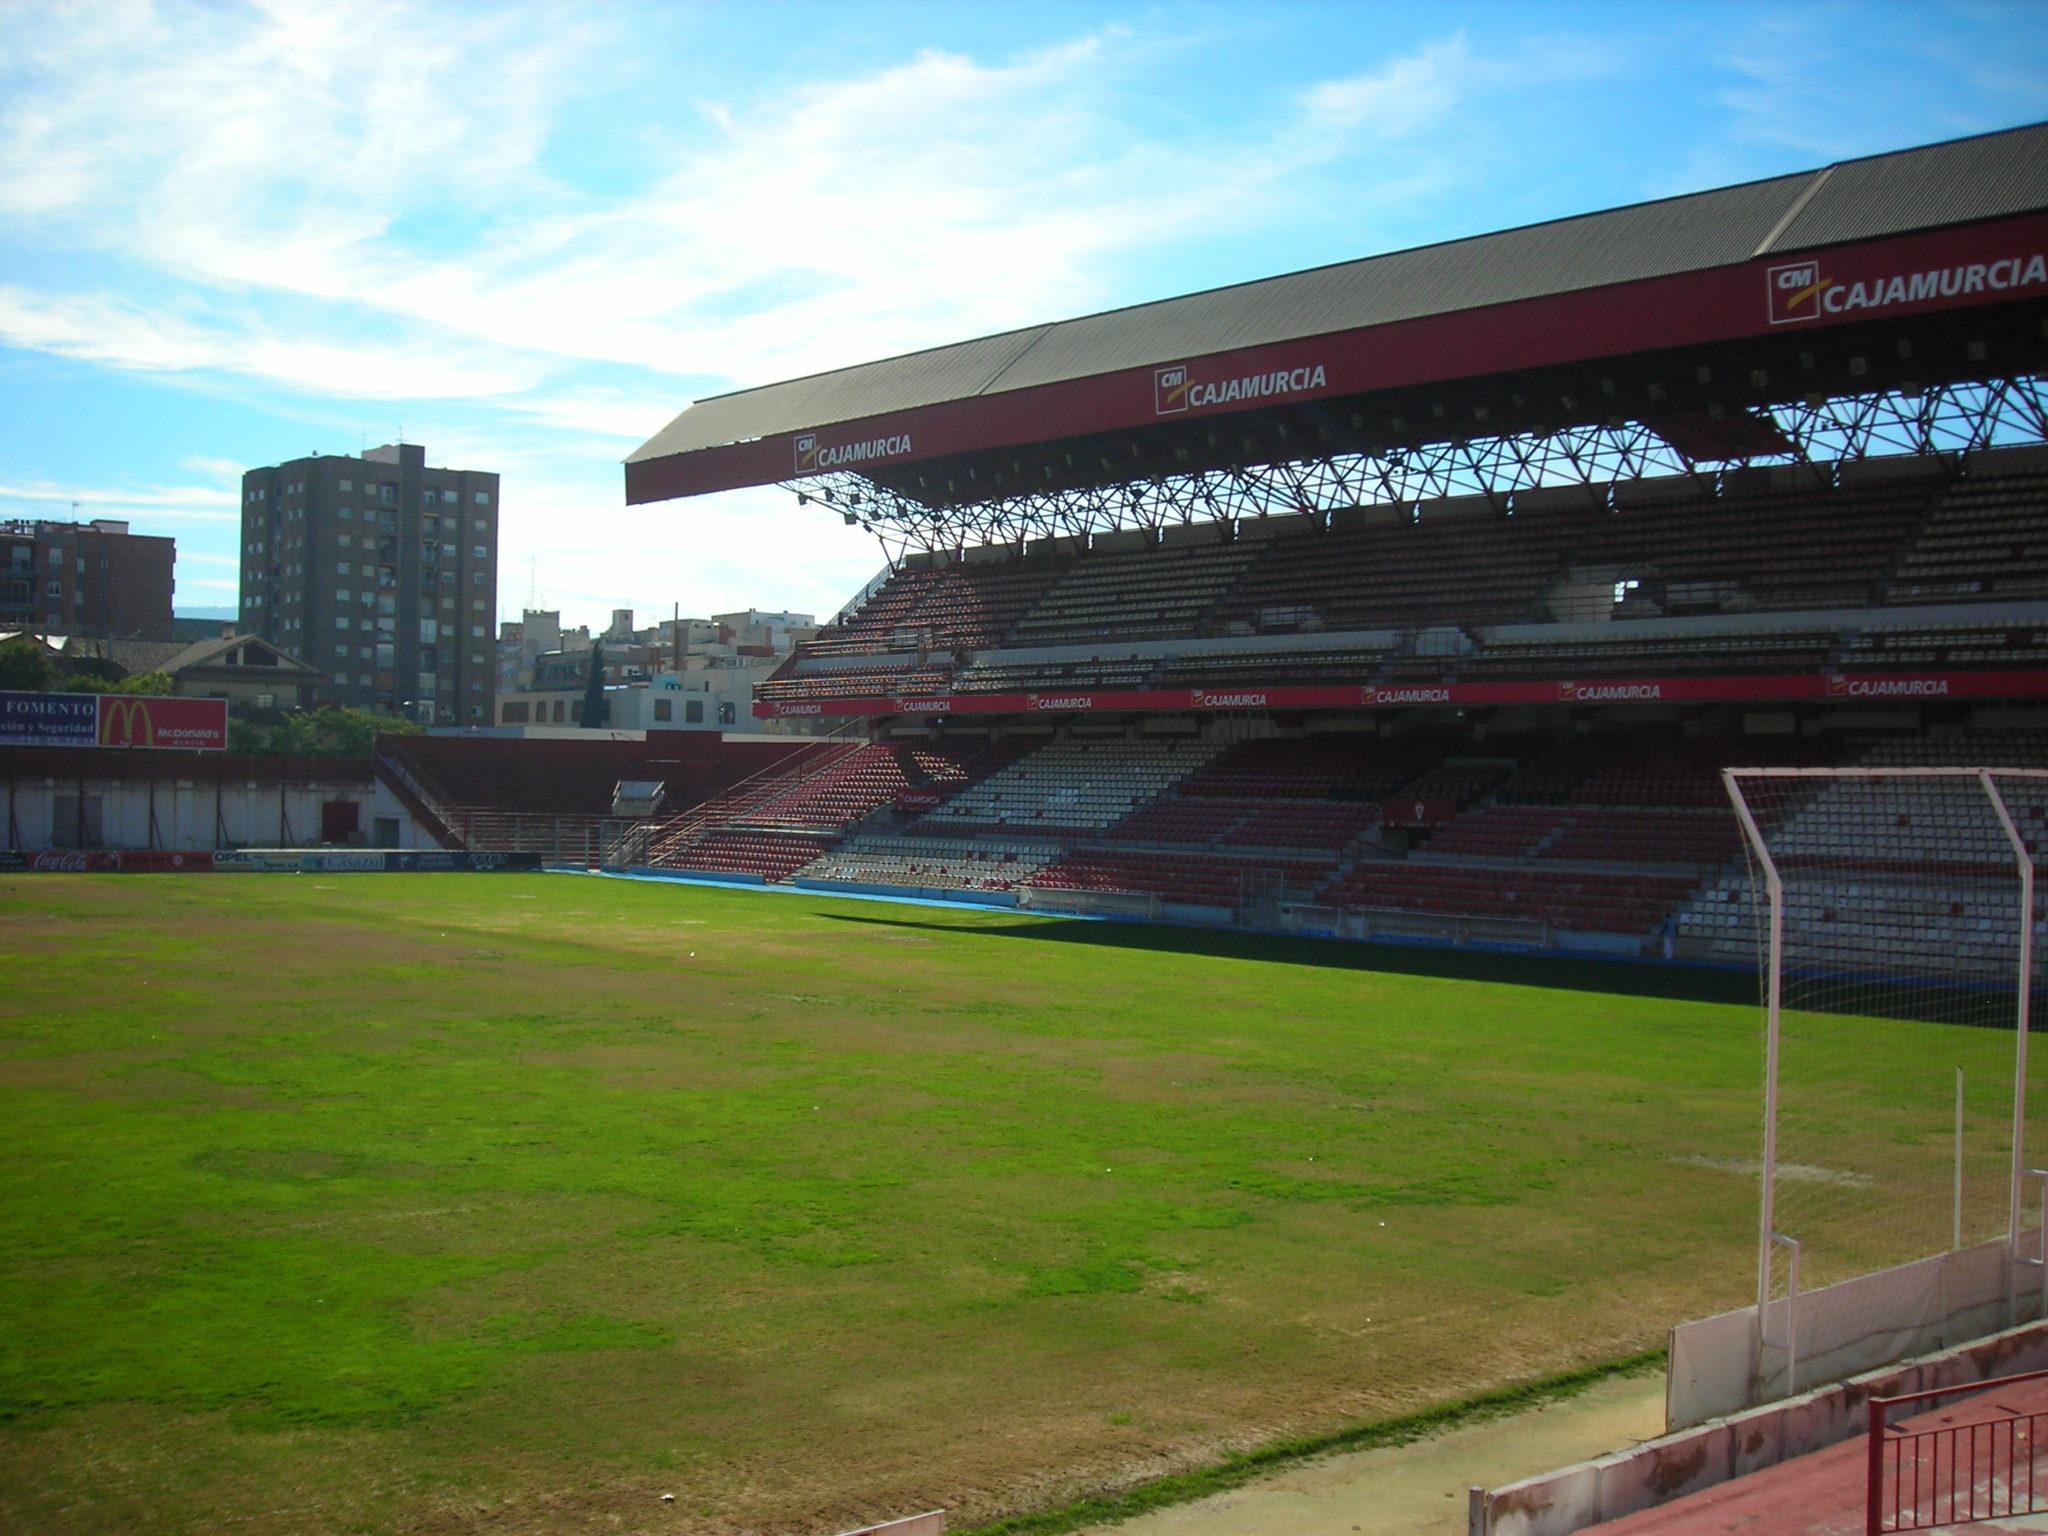 classic stadiums of Spanish football